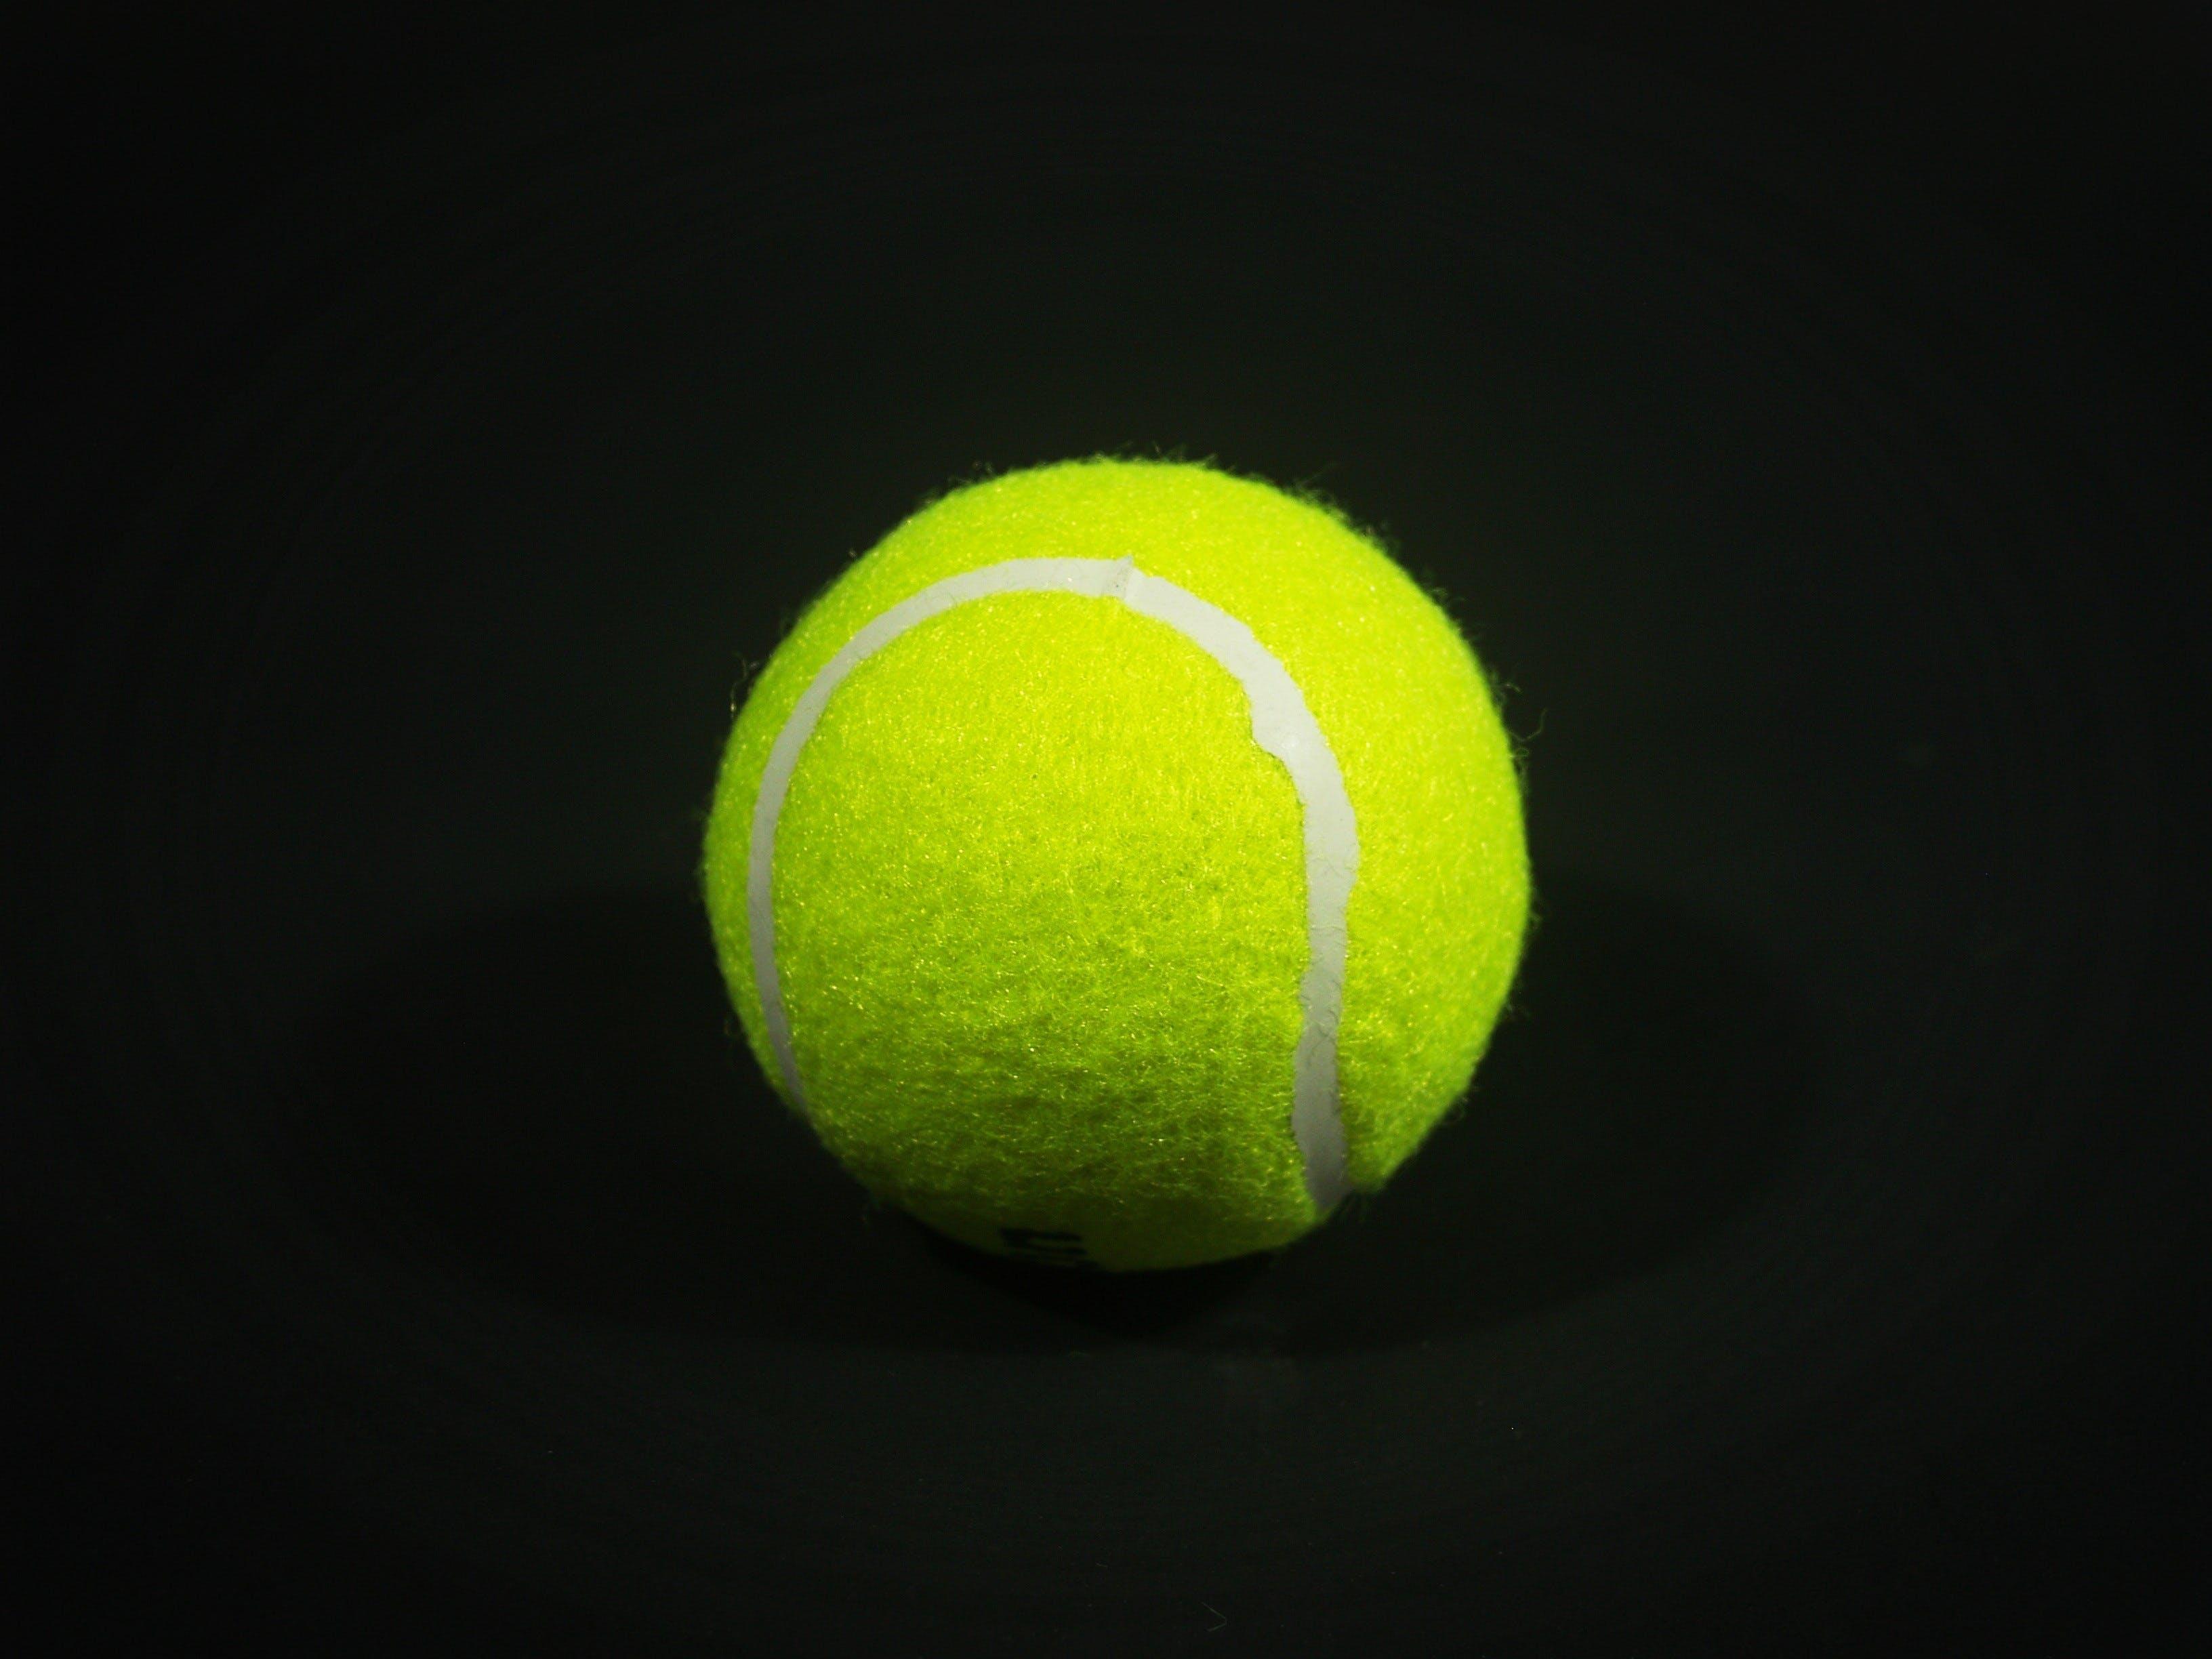 Free stock photo of yellow, sport, white, ball